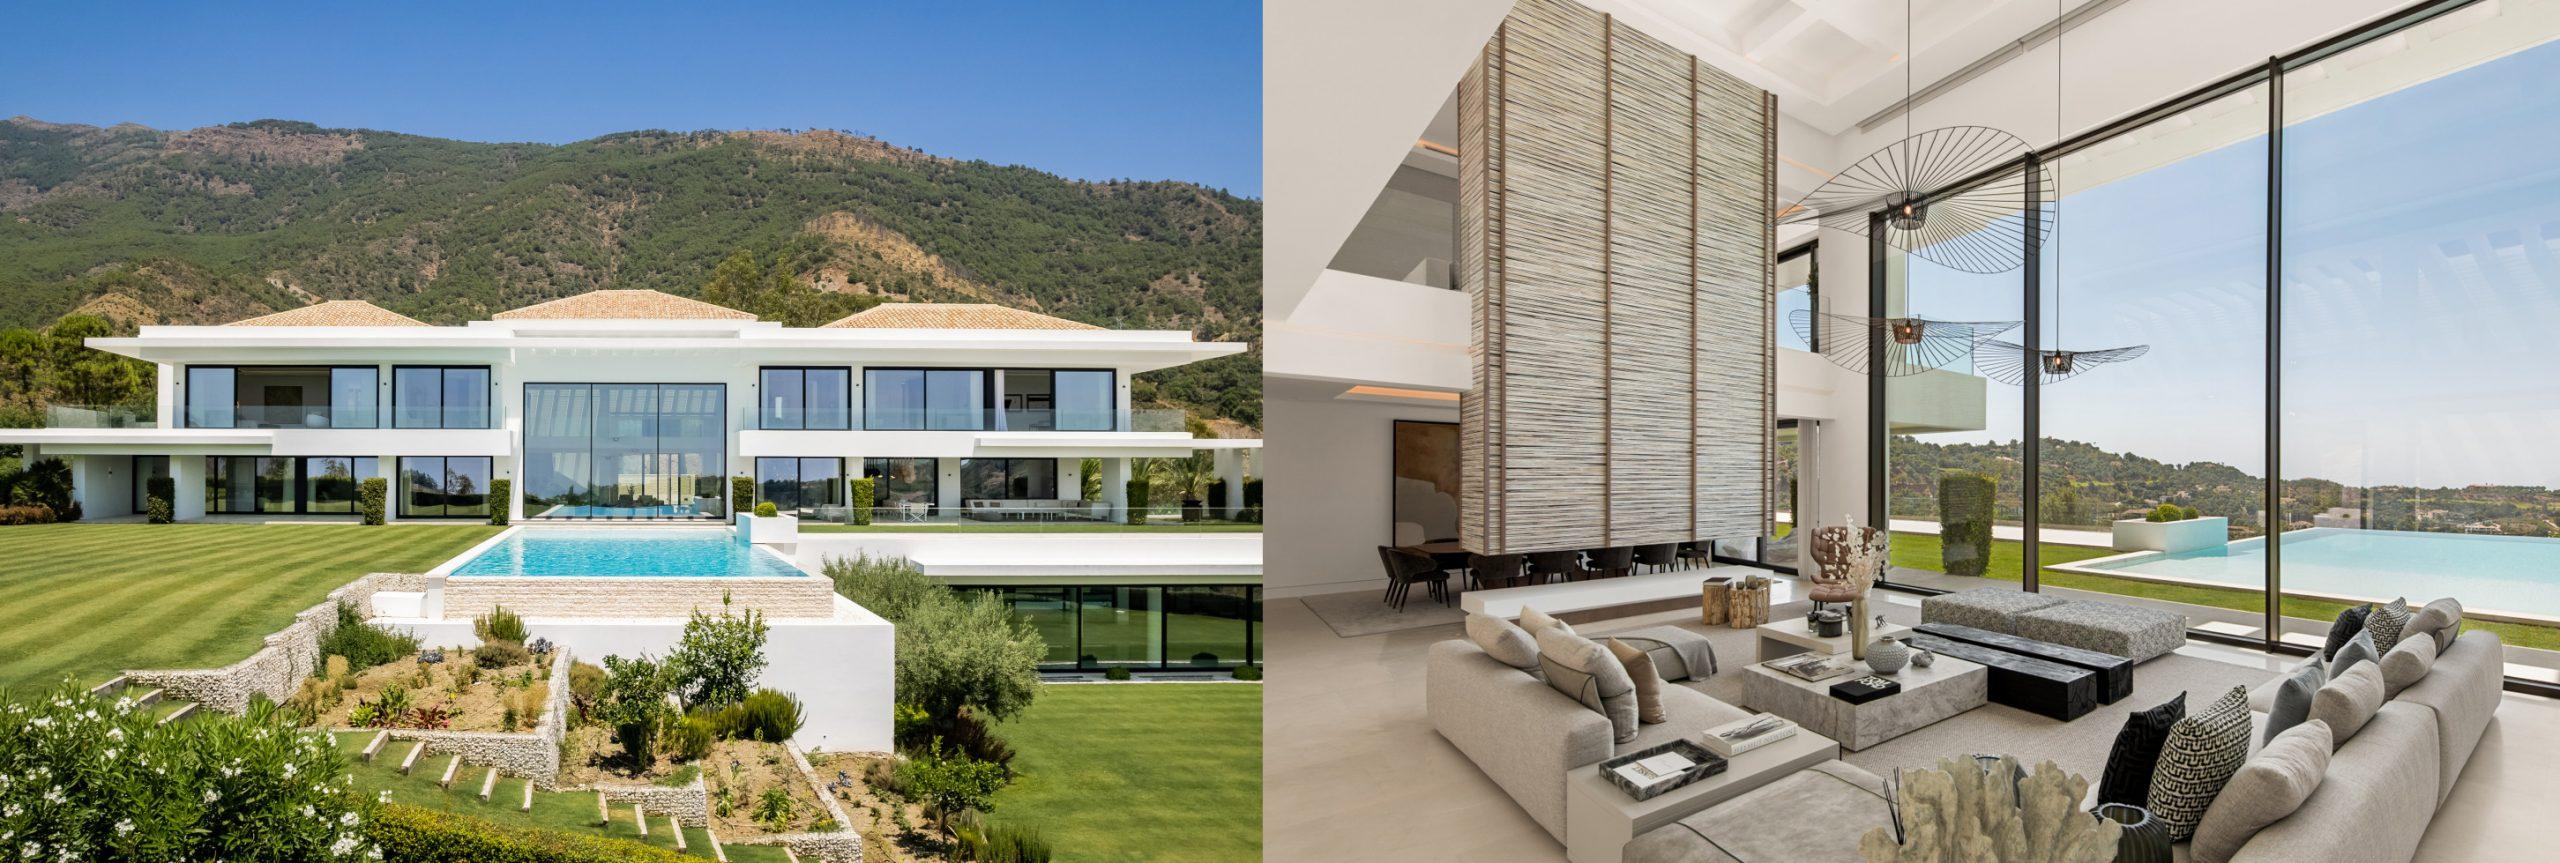 Villa Ibiza Breeze i La Zagaleta, Benahavís, €14.500.000